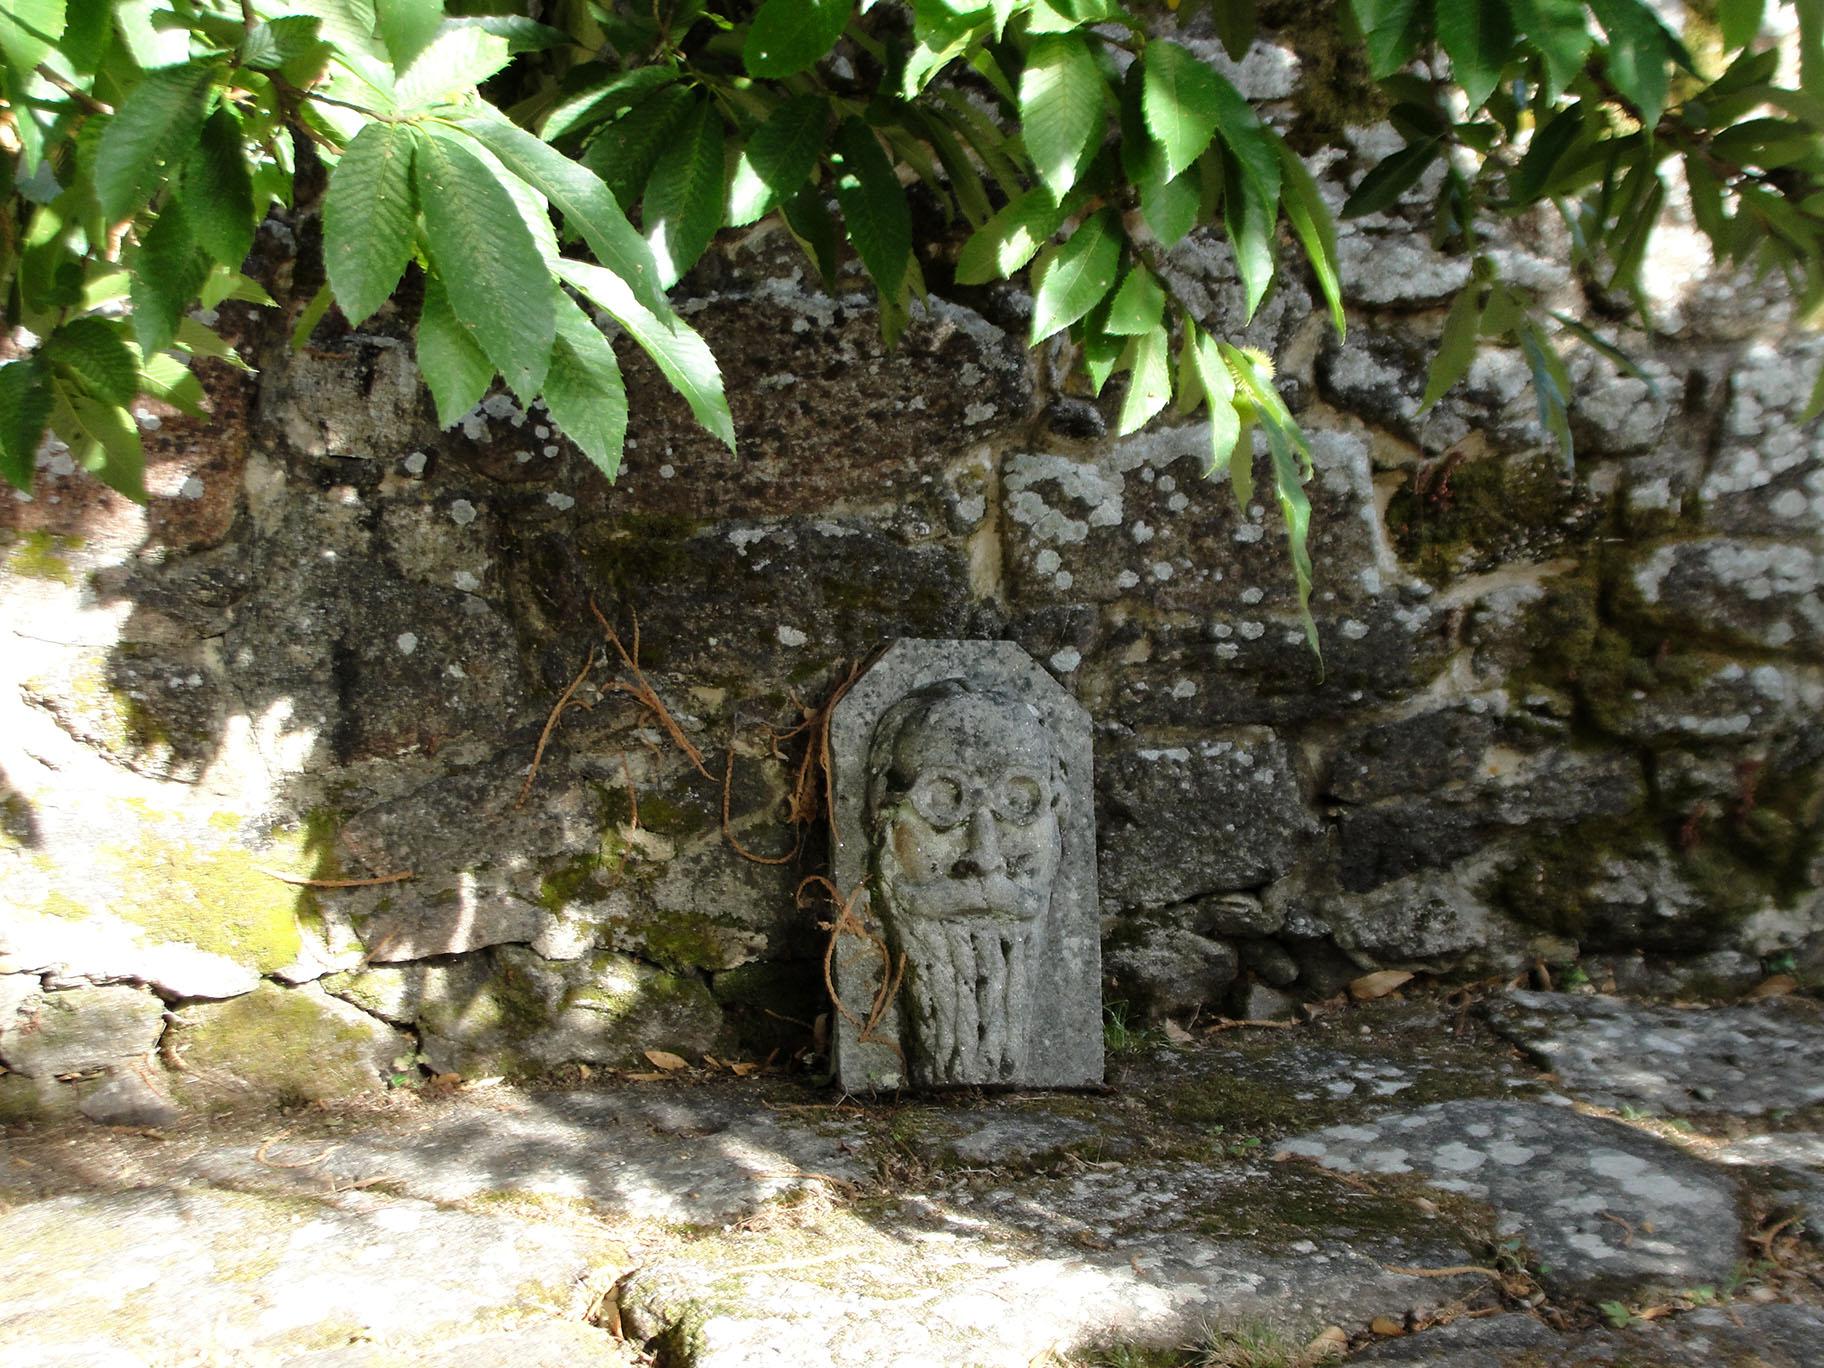 Casa museo valle incl n galiciangarden for Jardin umbrio valle inclan